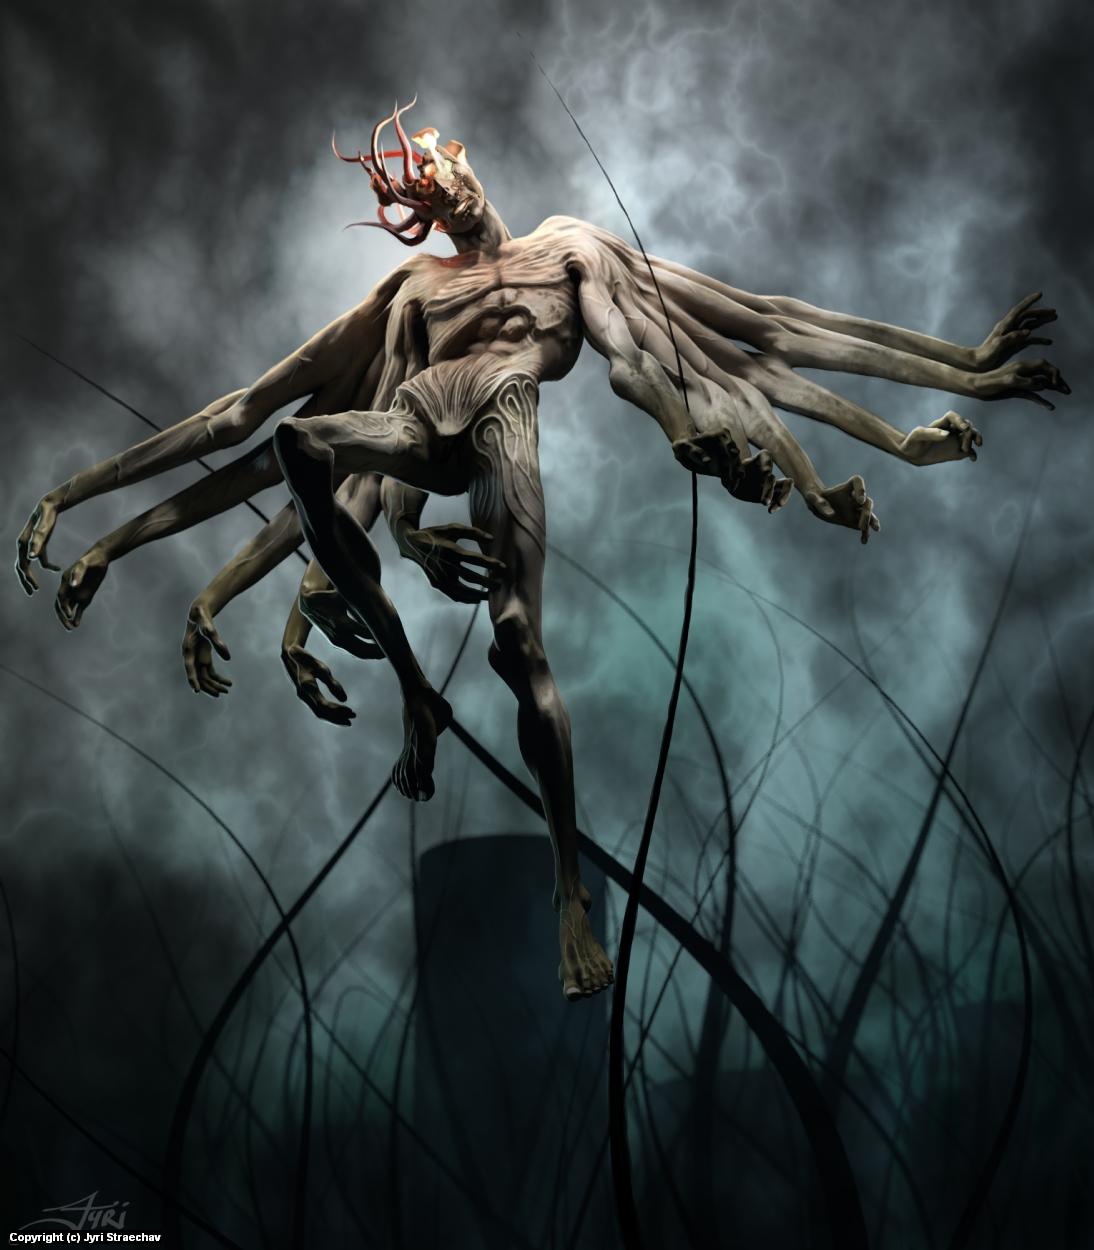 The Messenger Artwork by Jyri Straechav